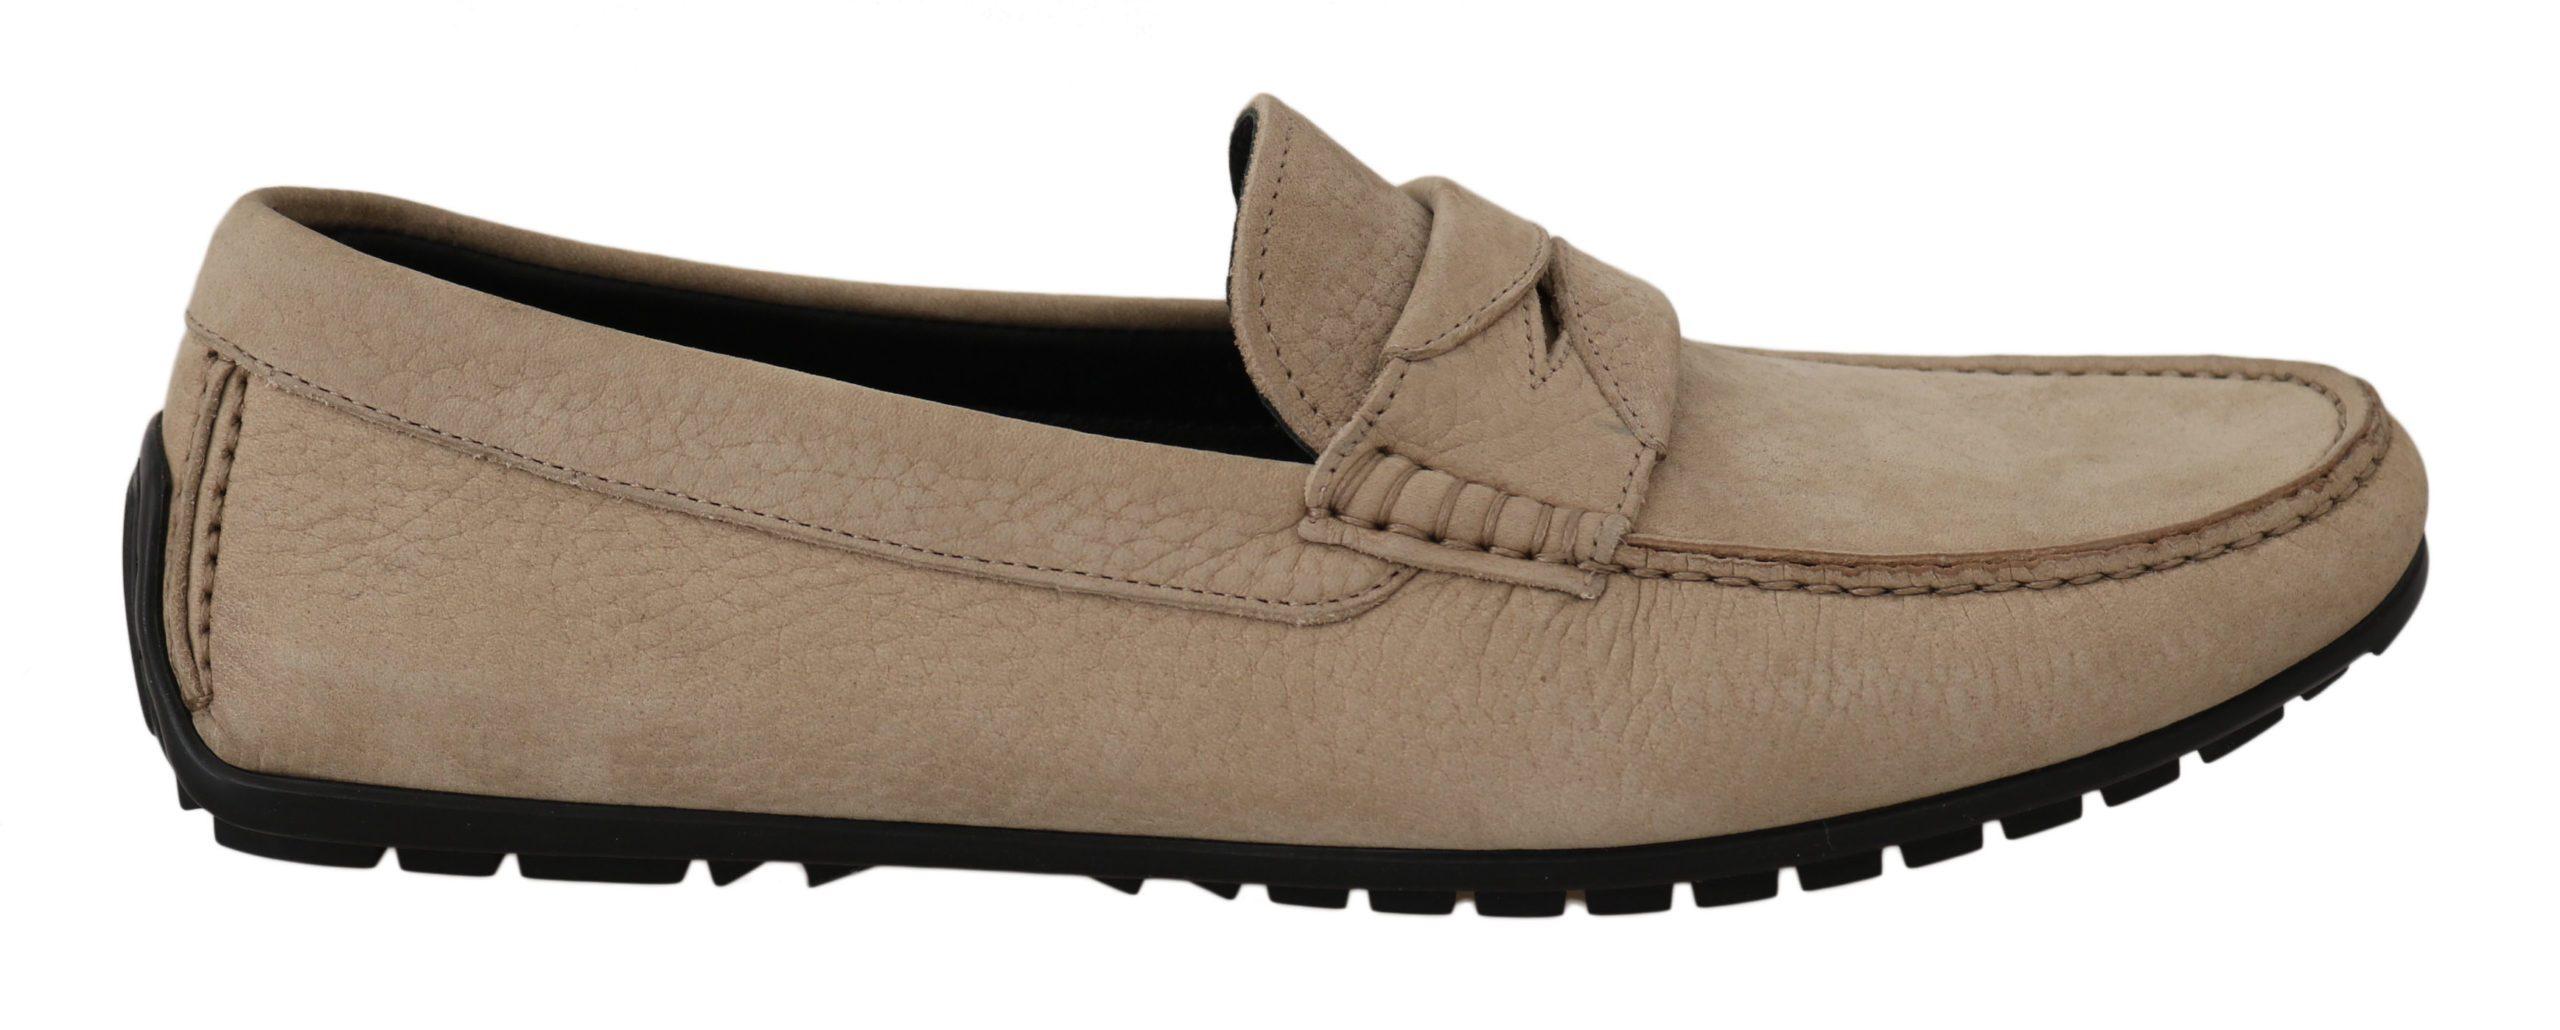 Dolce & Gabbana Men's Casual Shoes Beige MV2370 - EU42/US9